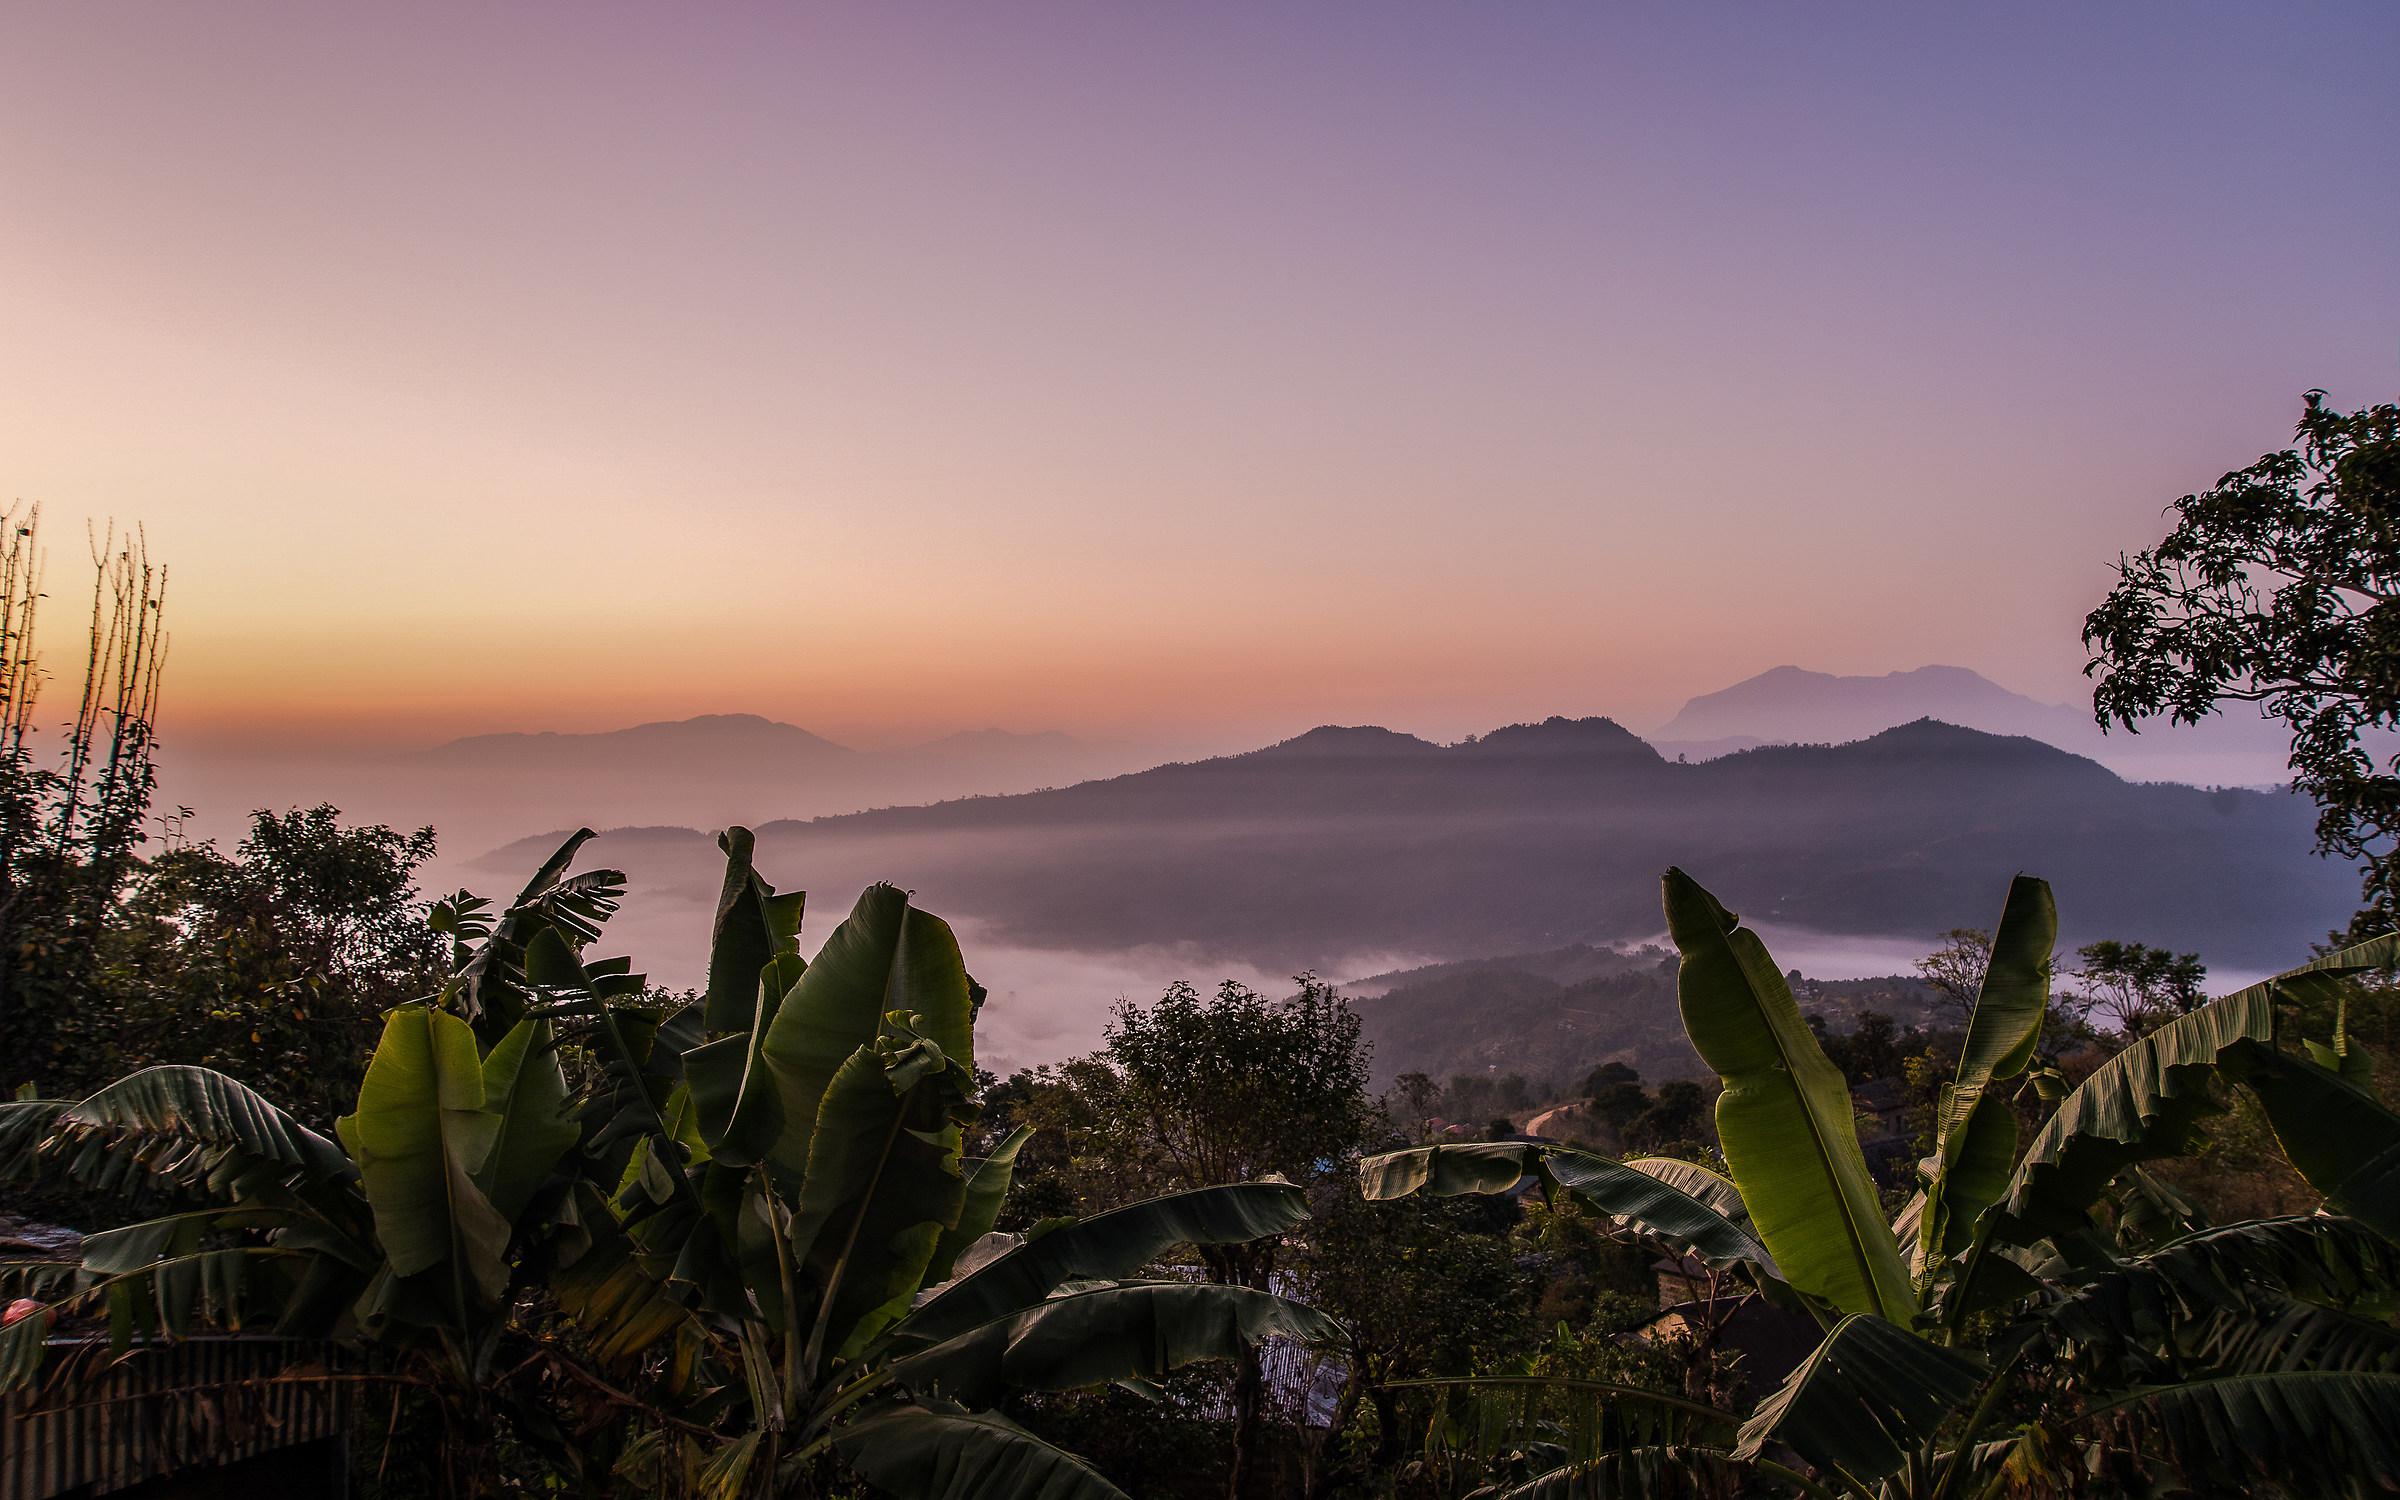 Sunrise in Palungtar...